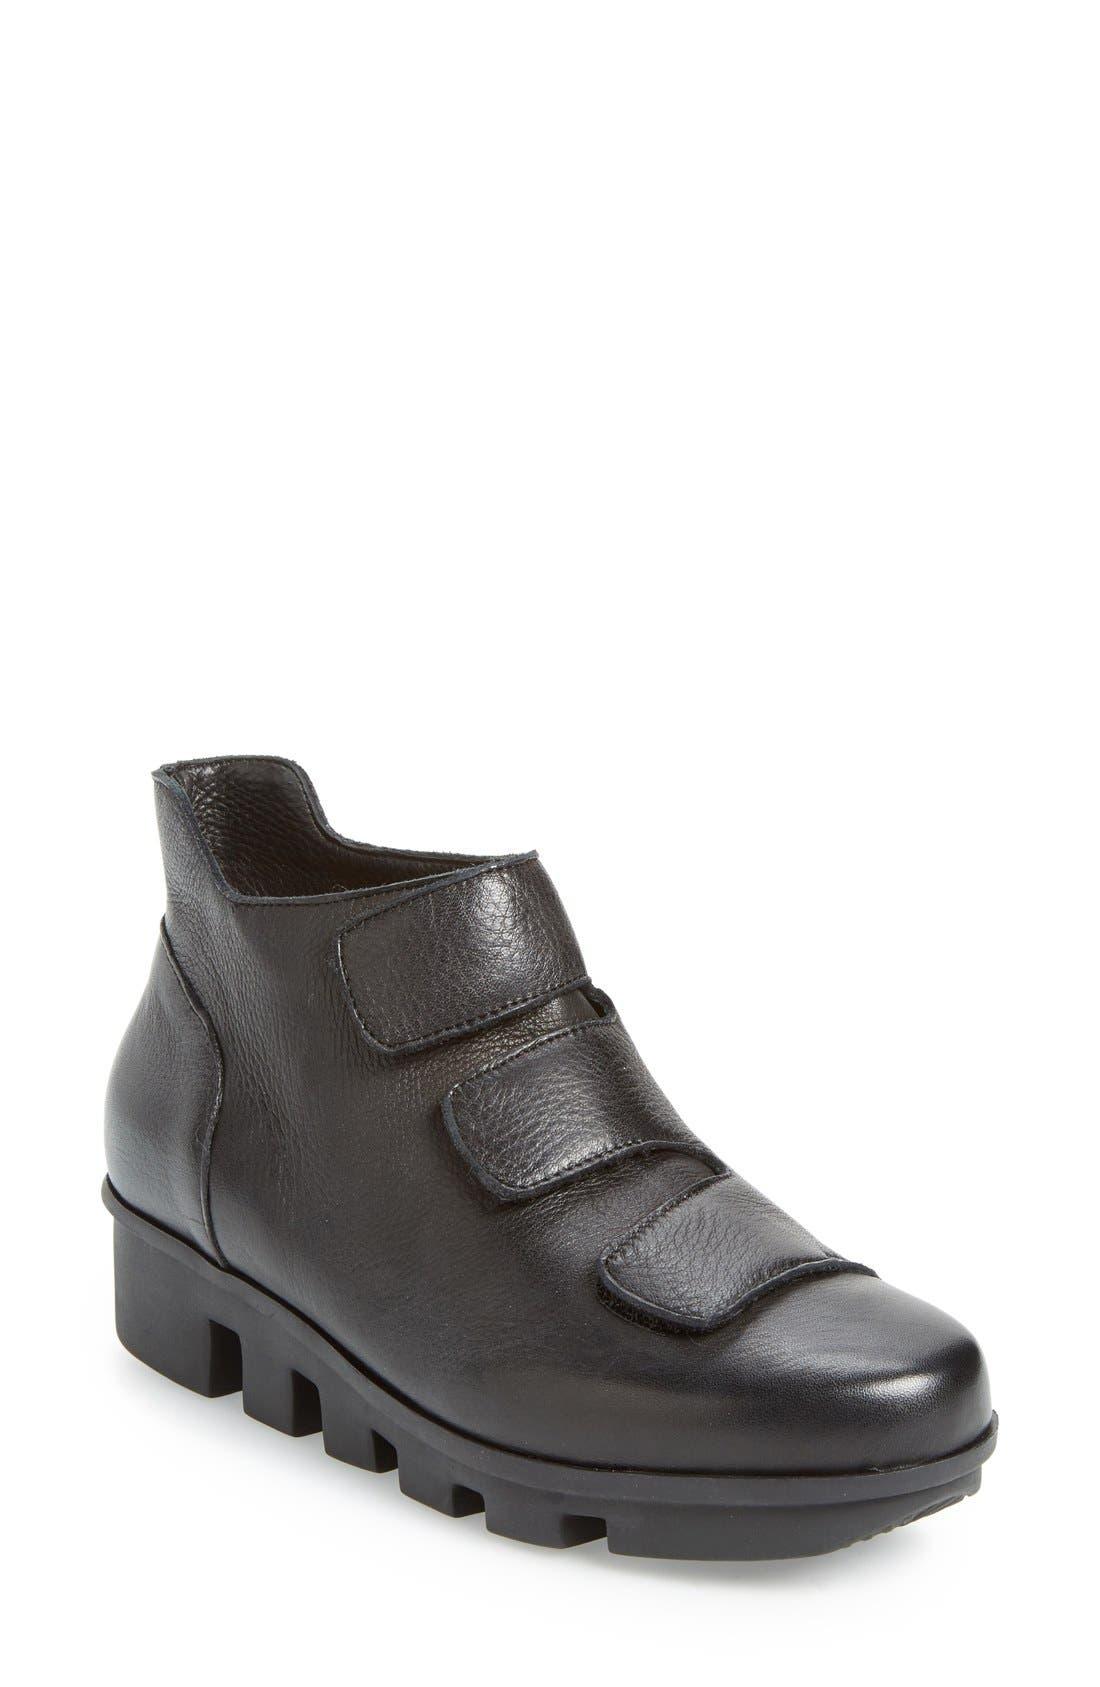 'Harmonee' Sneaker,                         Main,                         color, Black Leather